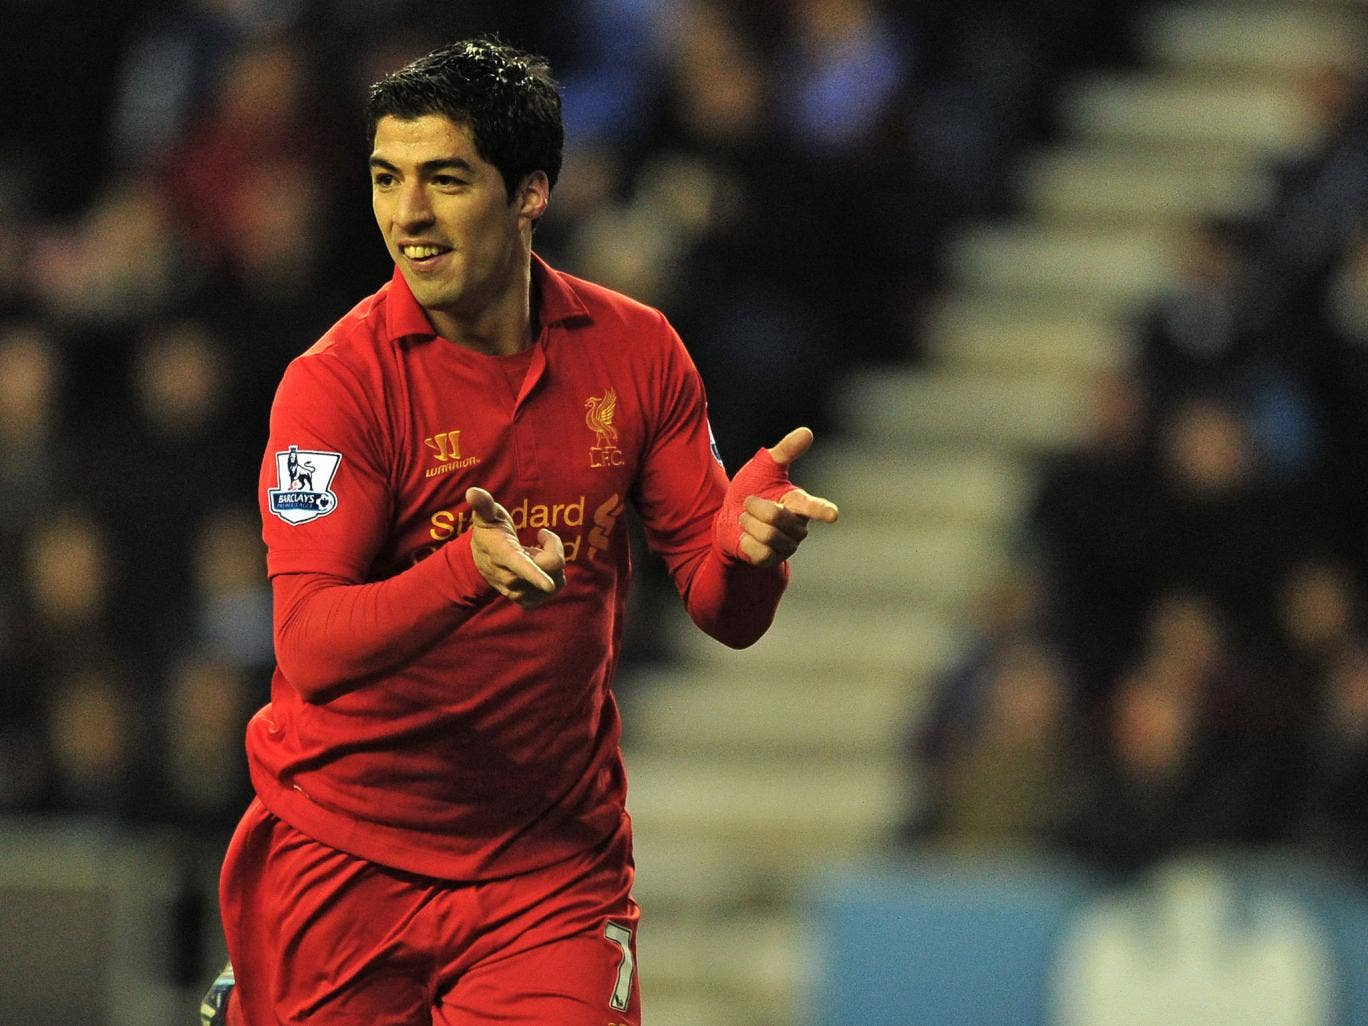 Liverpool's Uruguayan striker Luis Suarez celebrates scoring their second goal